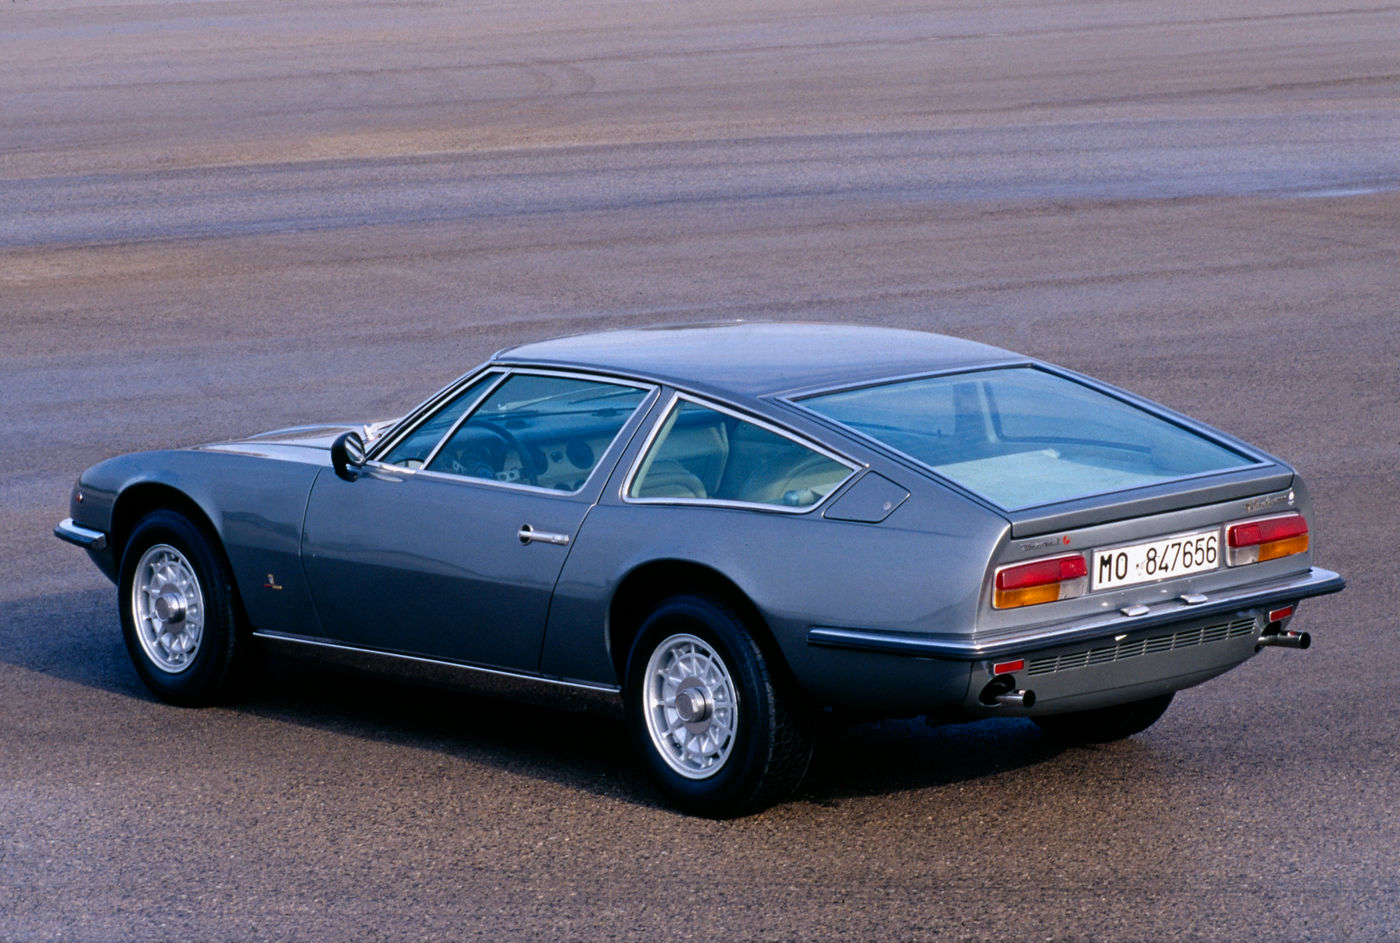 Maserati Classic - GranTurismo Indy - carrosserie grise - vue latérale postérieure